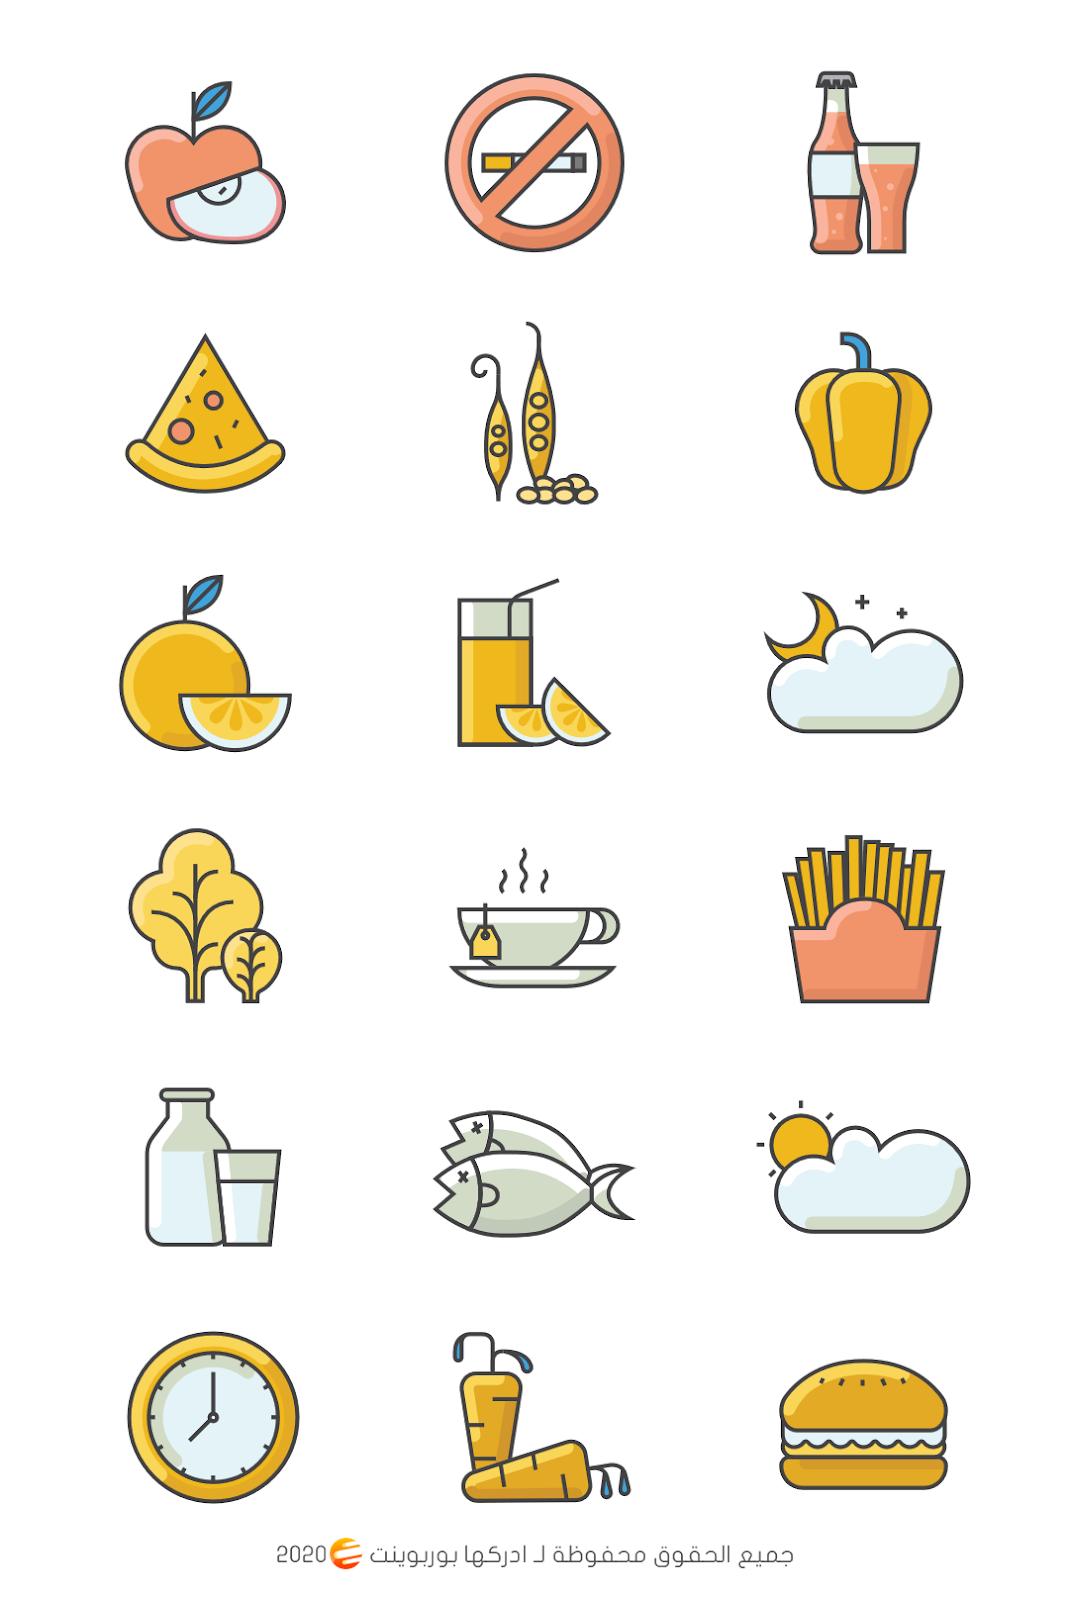 ايقونات طعام صحي للجيم - Healthy food icons